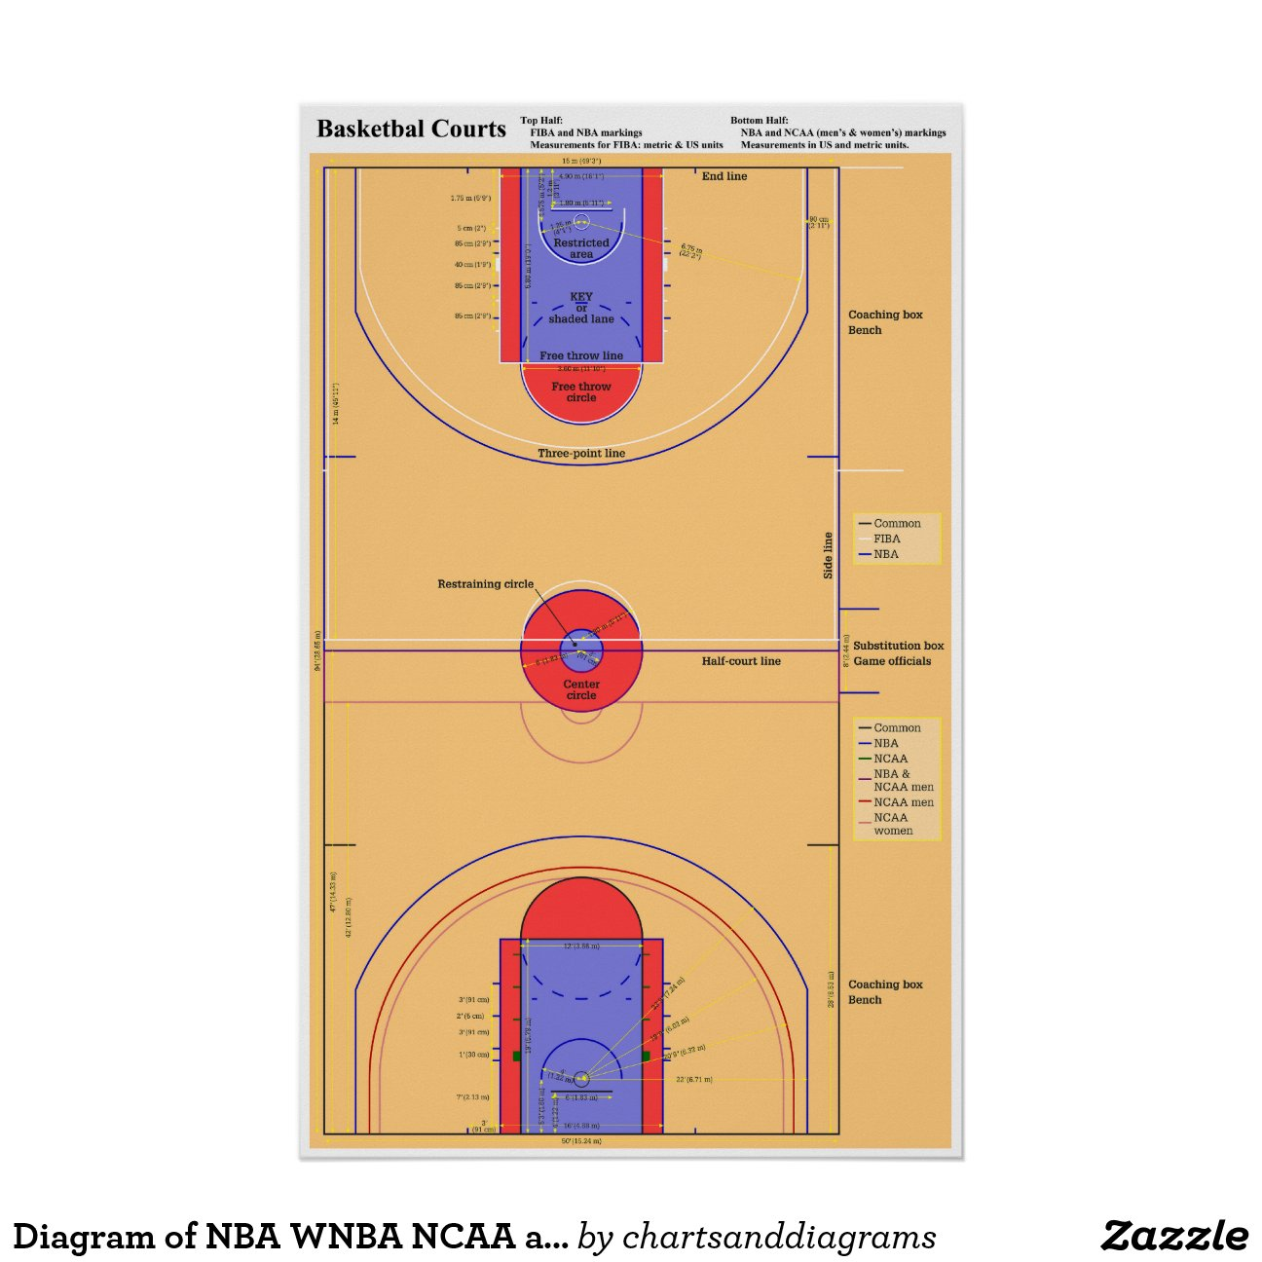 ncaa basketball court diagram danfoss 3 port motorised valve wiring of nba wnba and fiba poster